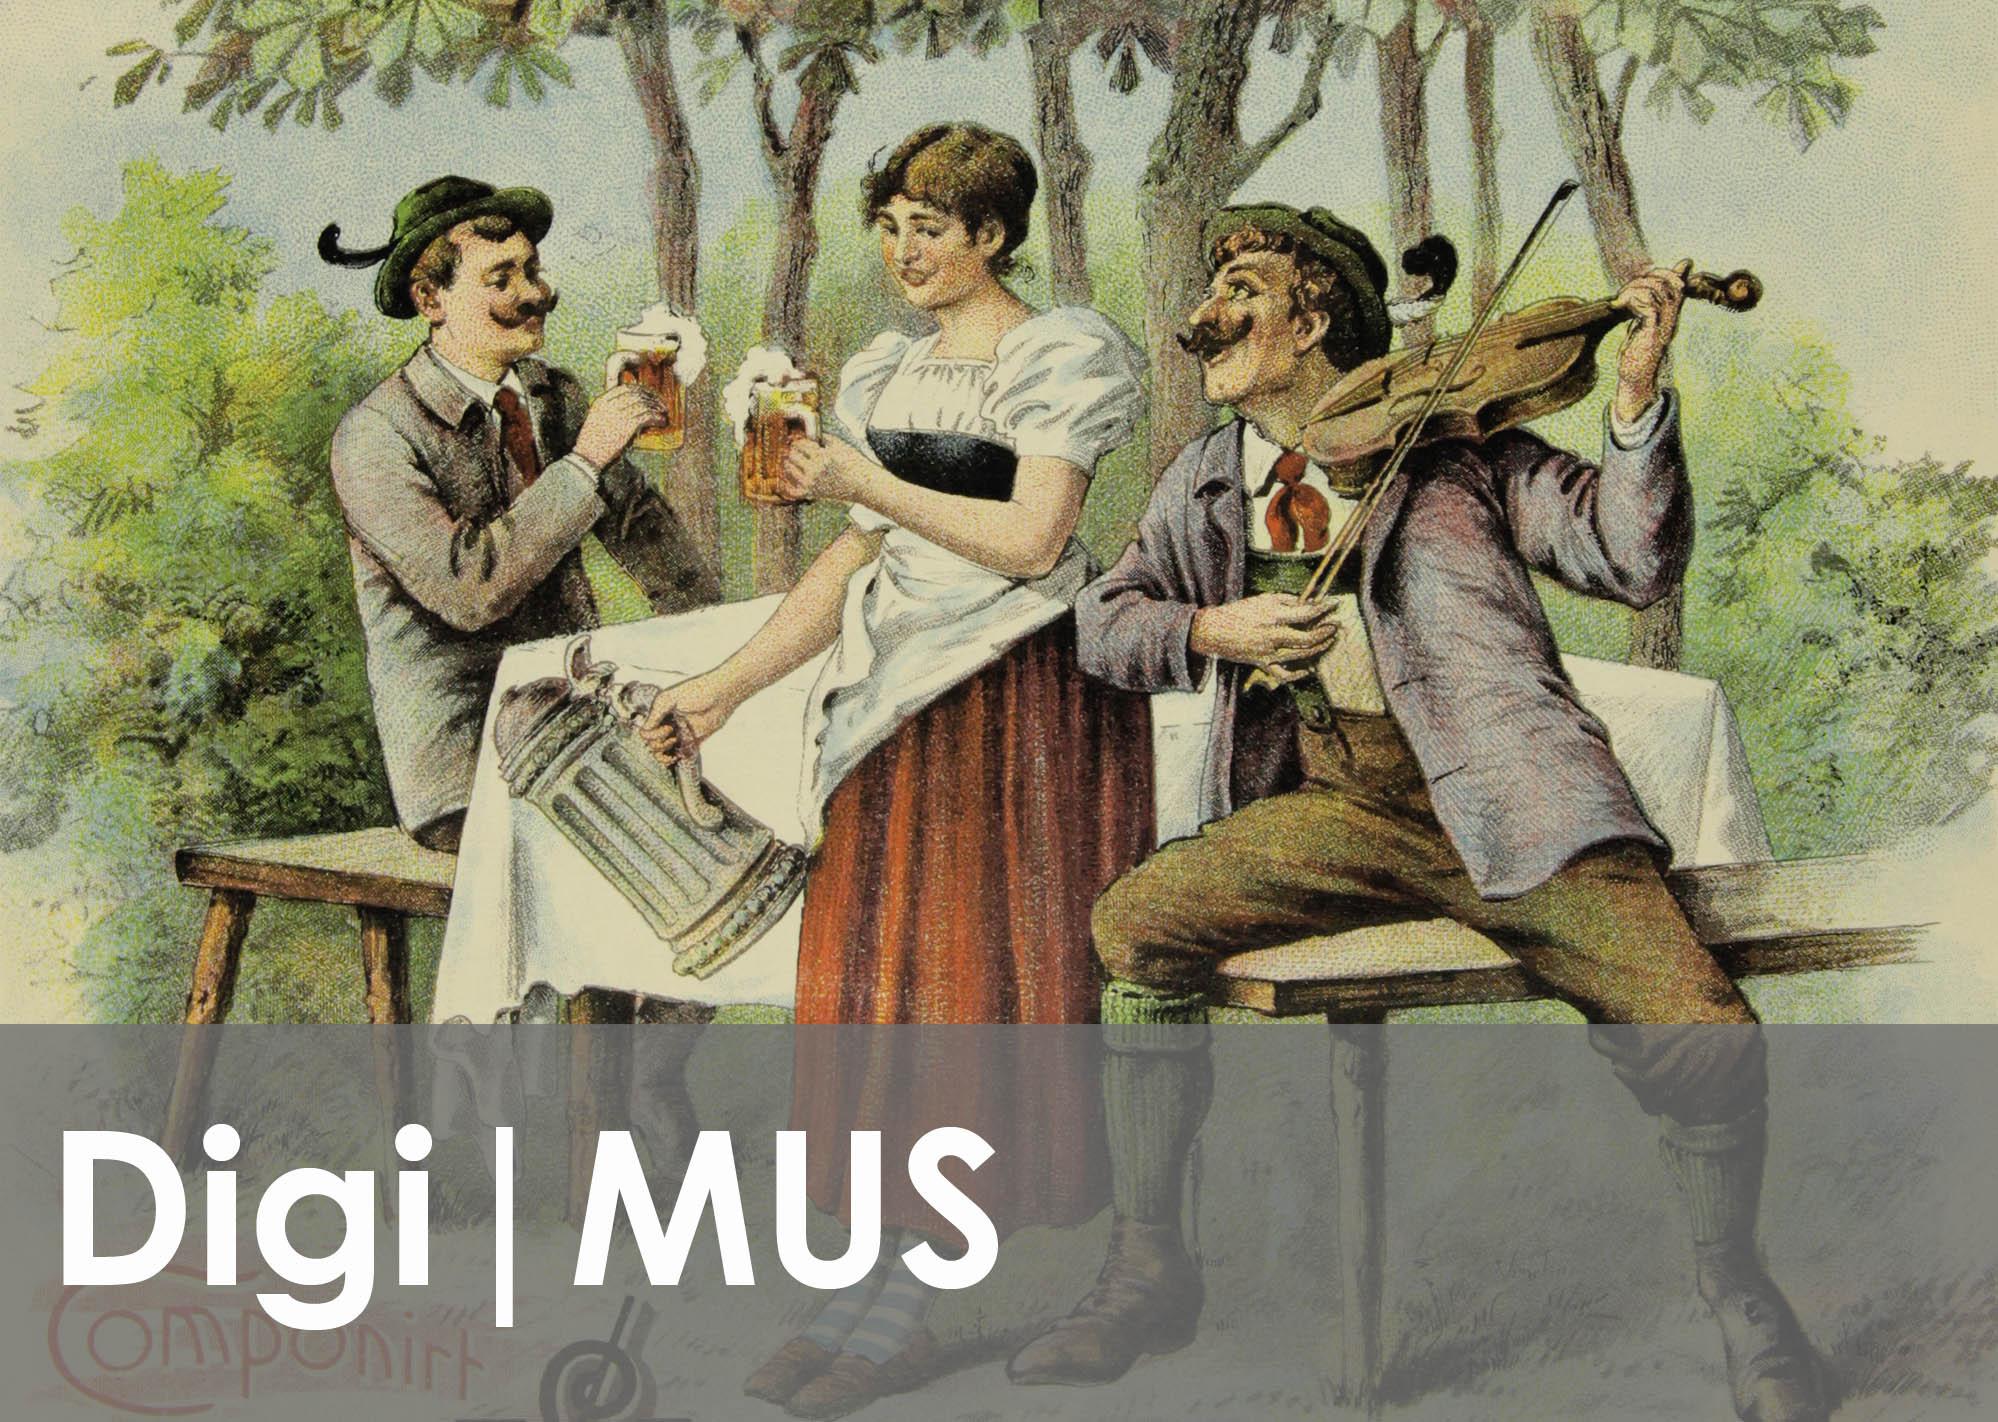 DigiMus